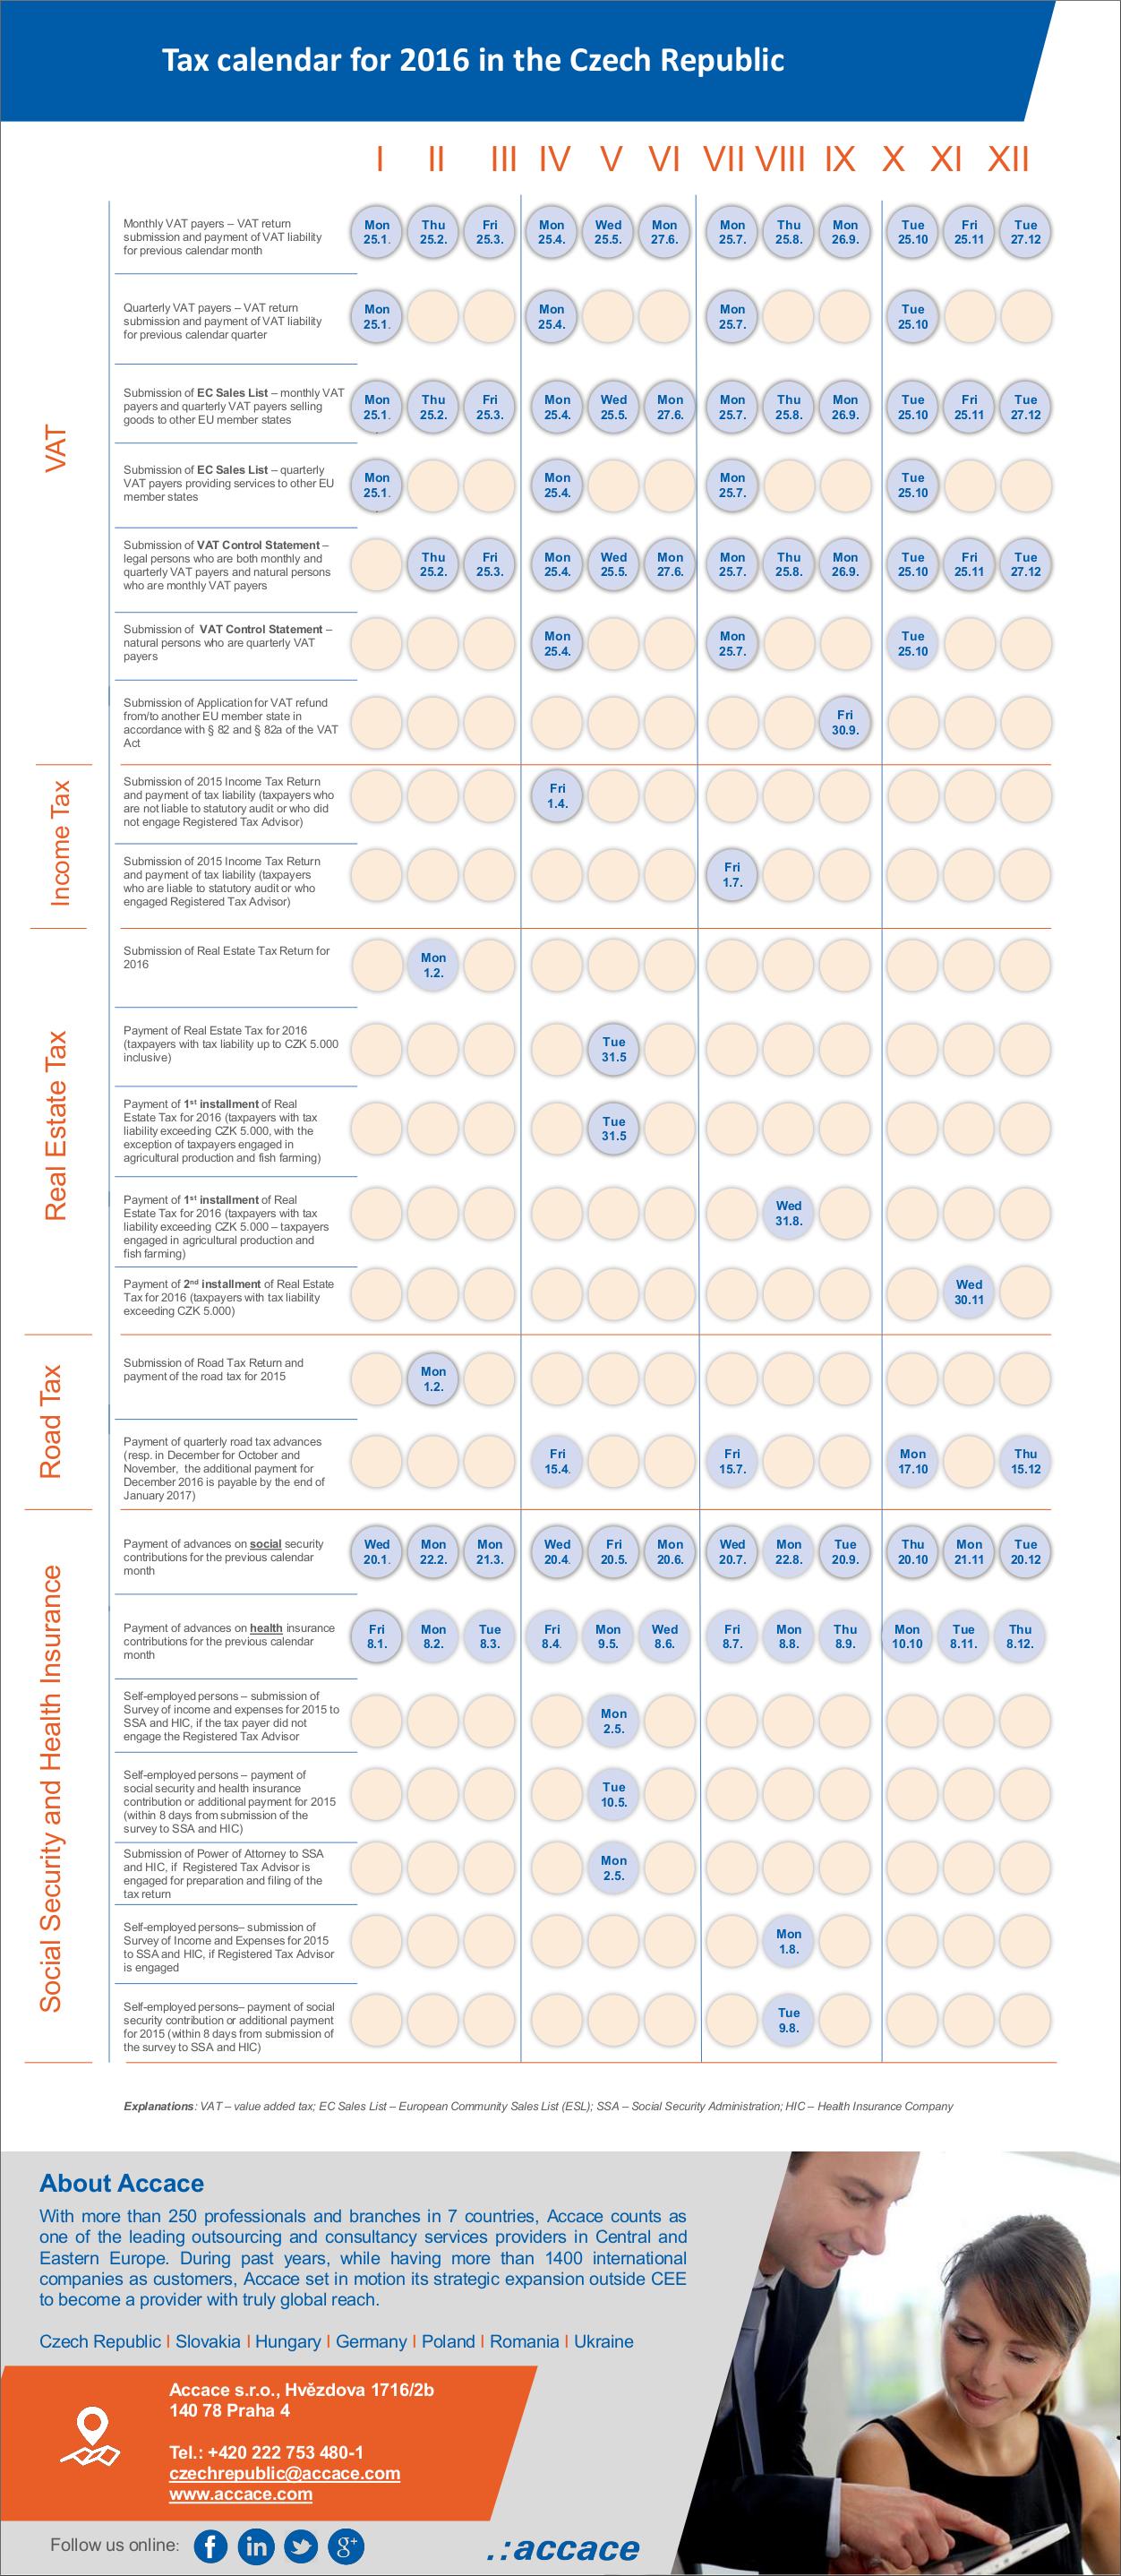 Tax calendar for 2016 in Czech Republic